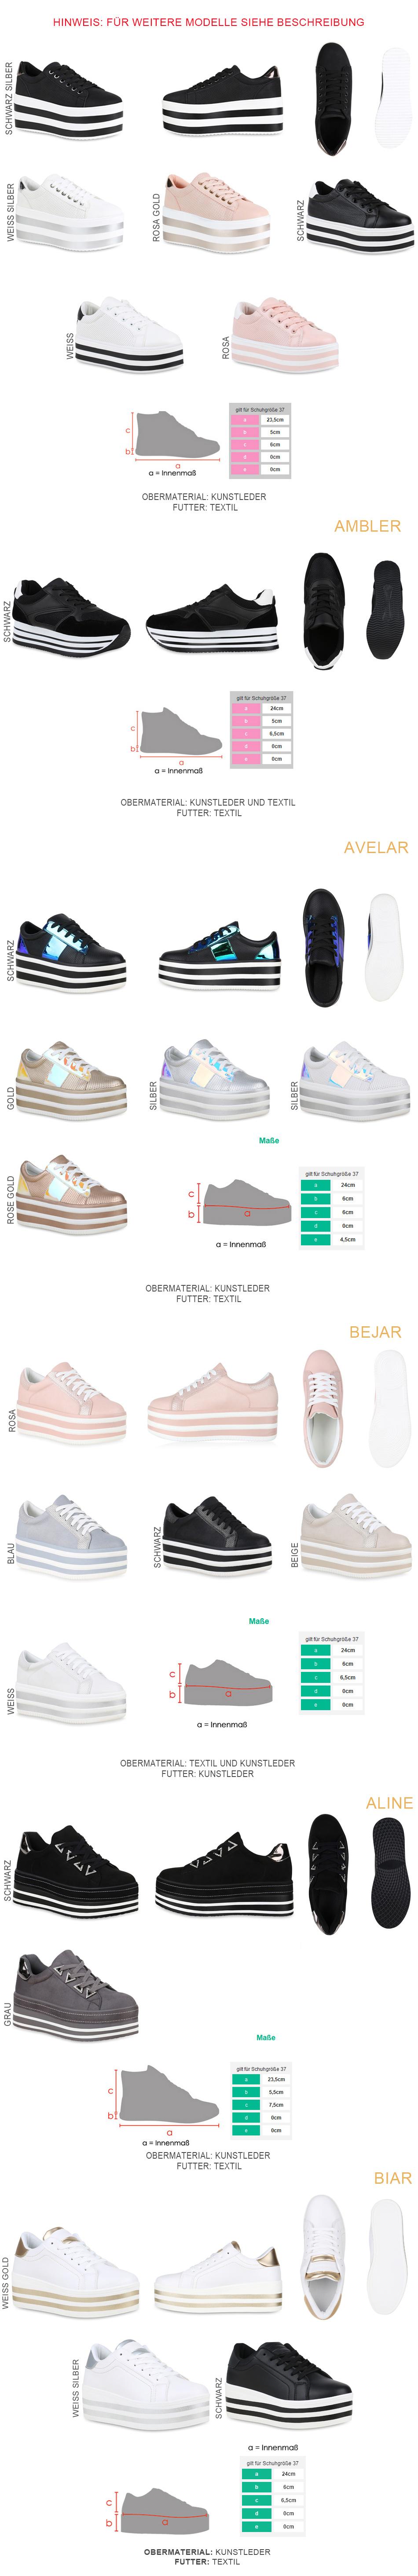 2458f02d0ba1ae Damen Plateau Sneaker Basic Leder-Optik Schuhe Schnürer 821938 New ...